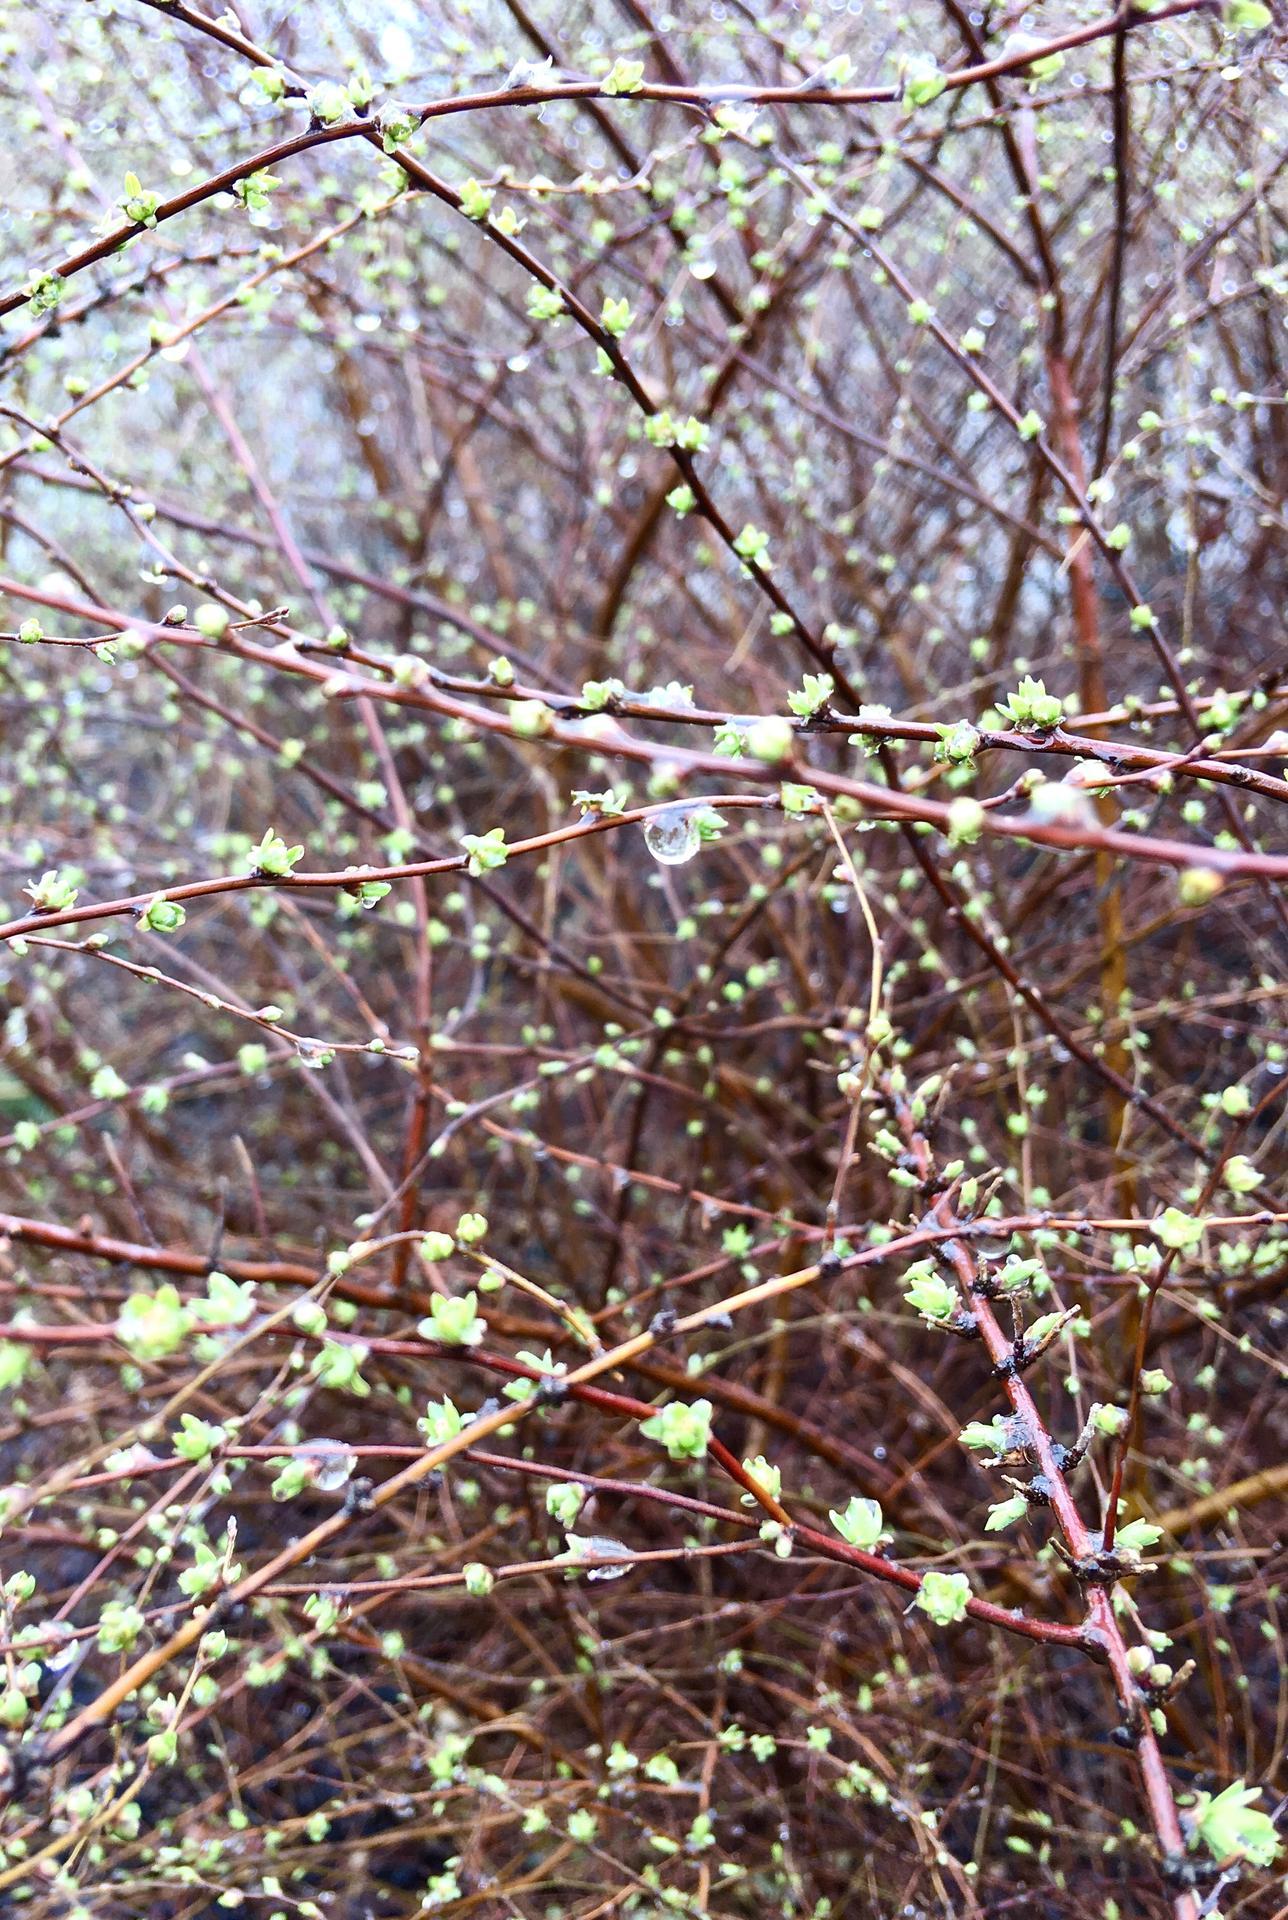 Zahrada 2020 - tavolniky uz  vylozene ladi jarni formu 😍